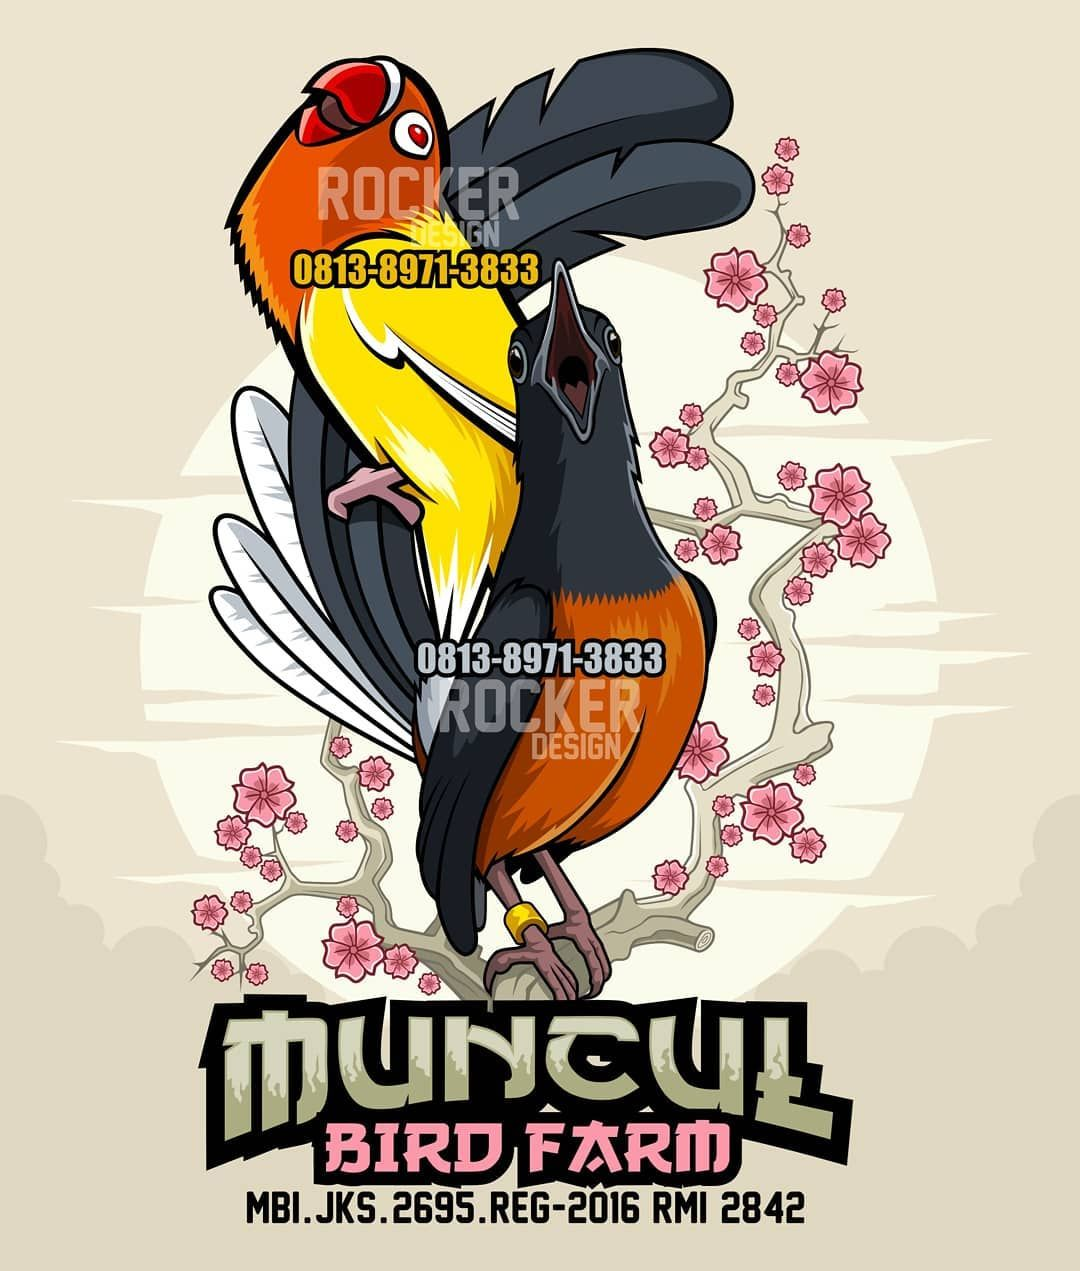 MUNCUL BIRD FARM LOGO For order design Mail rocker